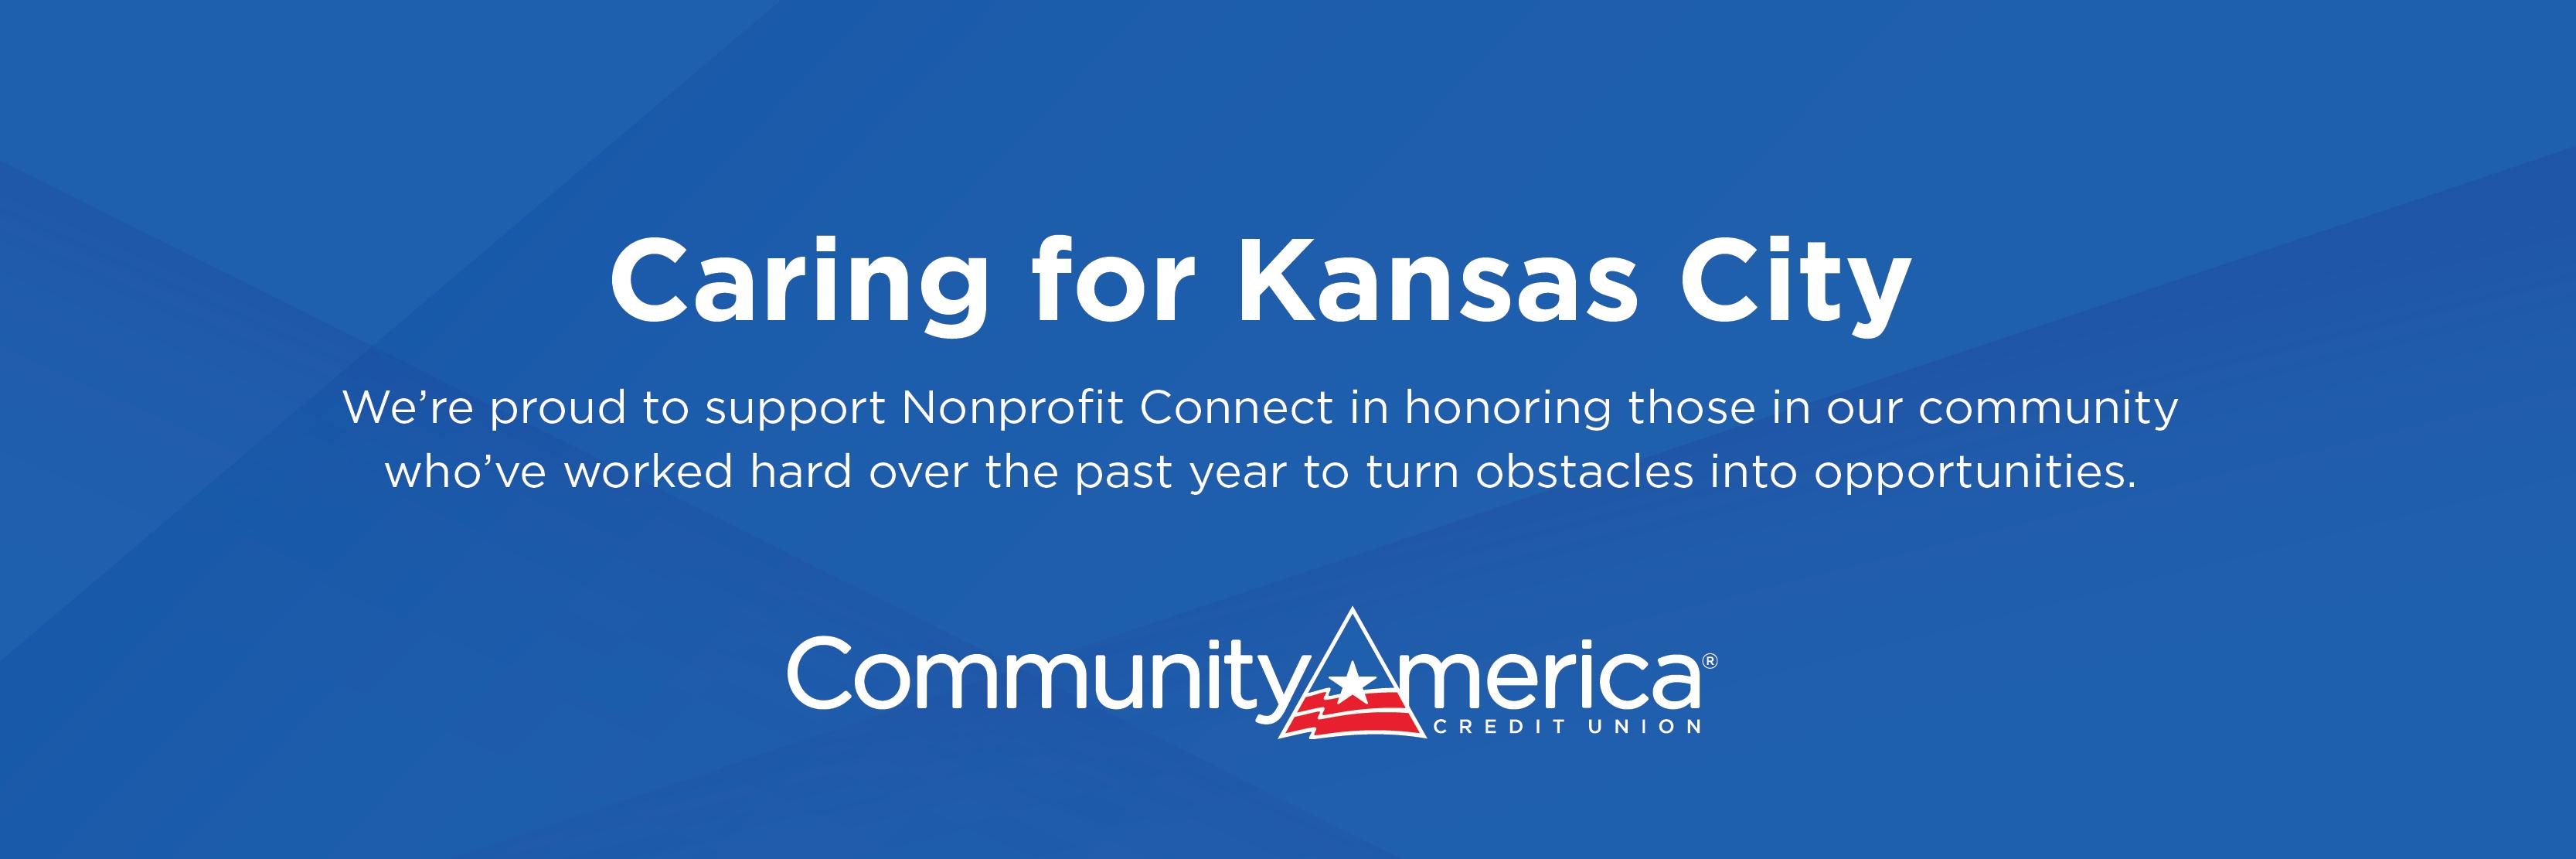 CommunityAmerica Credit Union_Banner Image